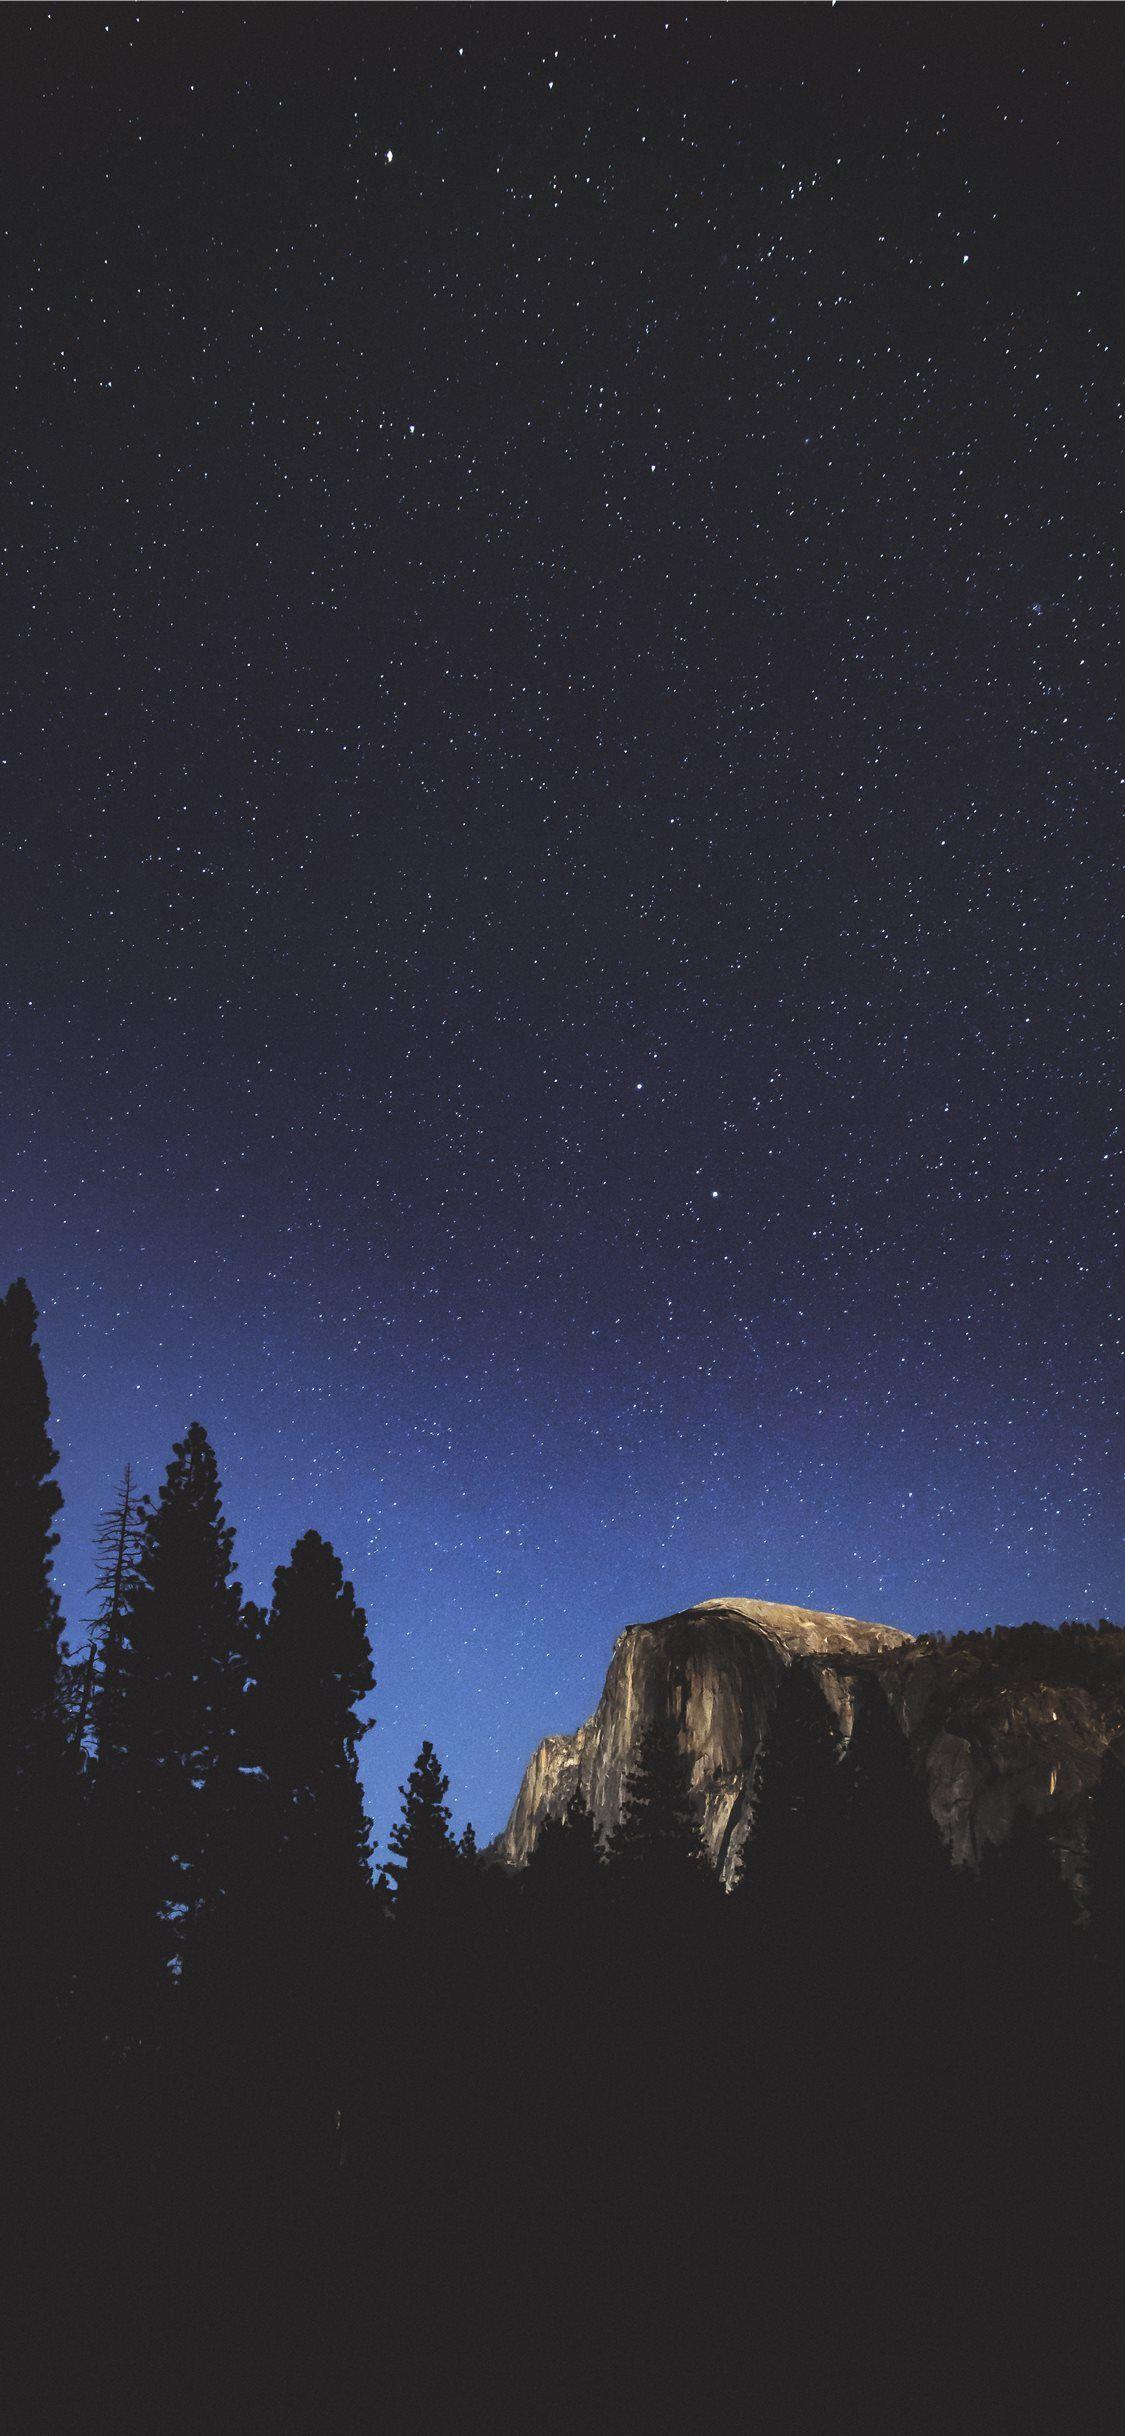 Silhouette Of Tree At Night Wallpaper Night Sky Wallpaper Iphone Wallpaper Night Sky Nature Iphone Wallpaper